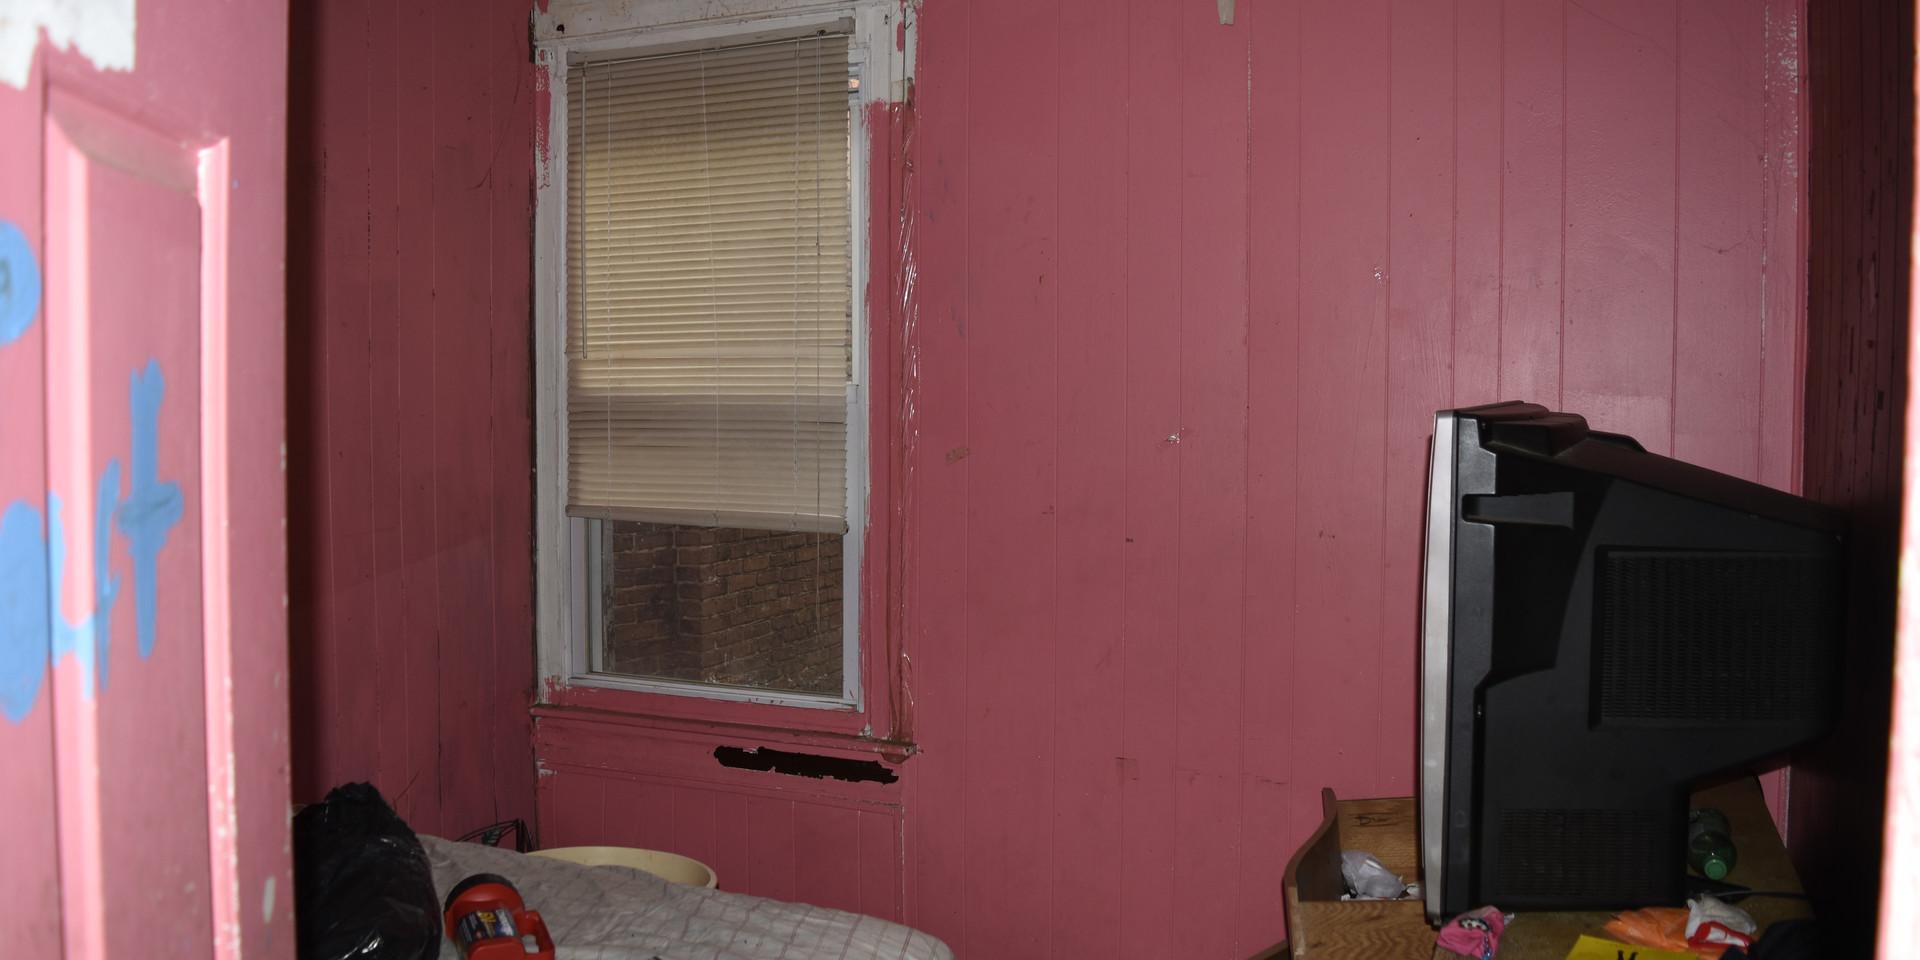 010 Second Bedroom 3.jpg